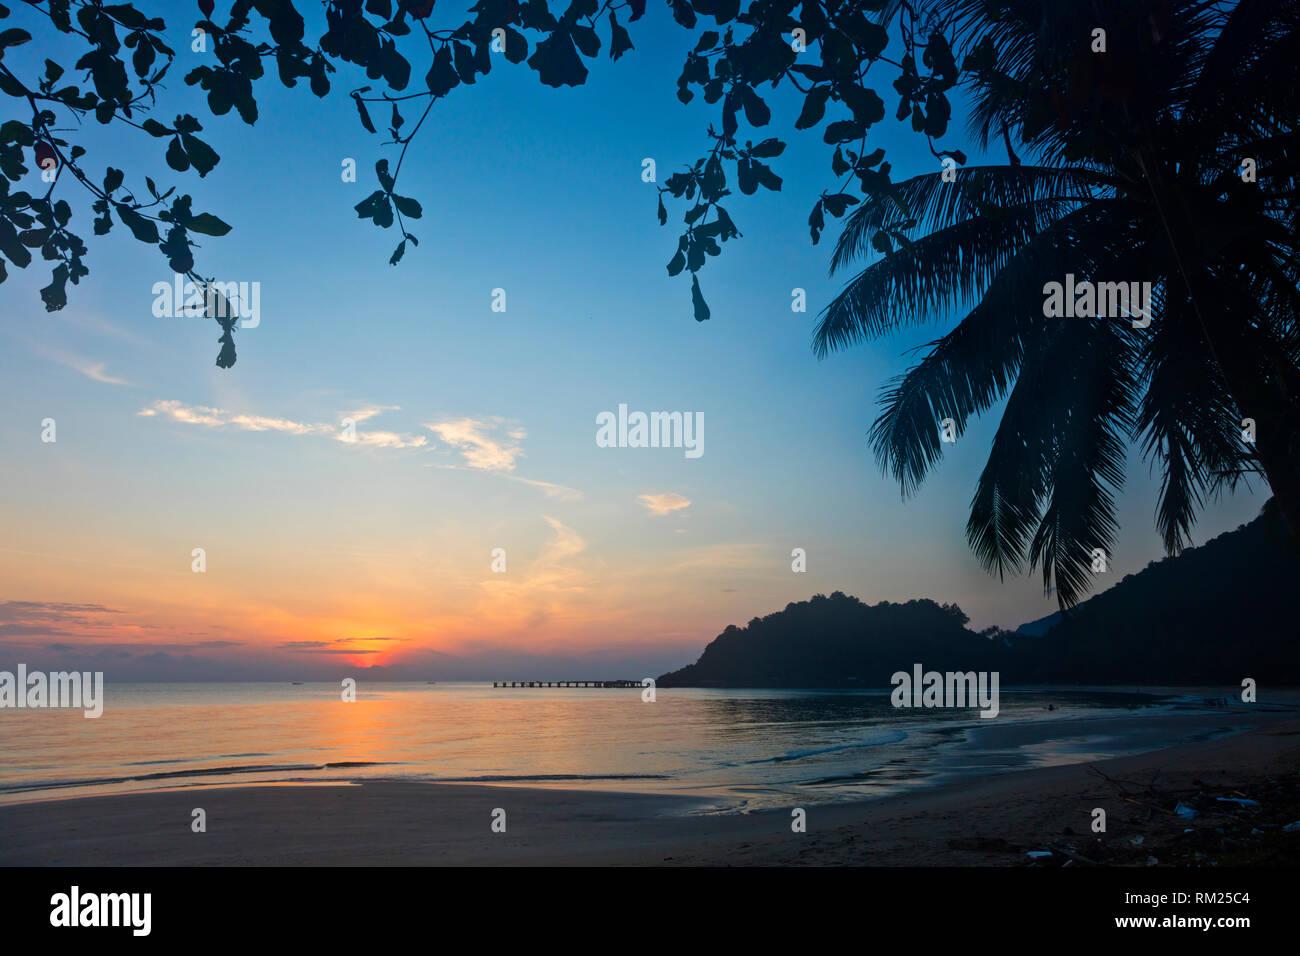 Sunrise on the beach of KHANOM THAILAND - Stock Image